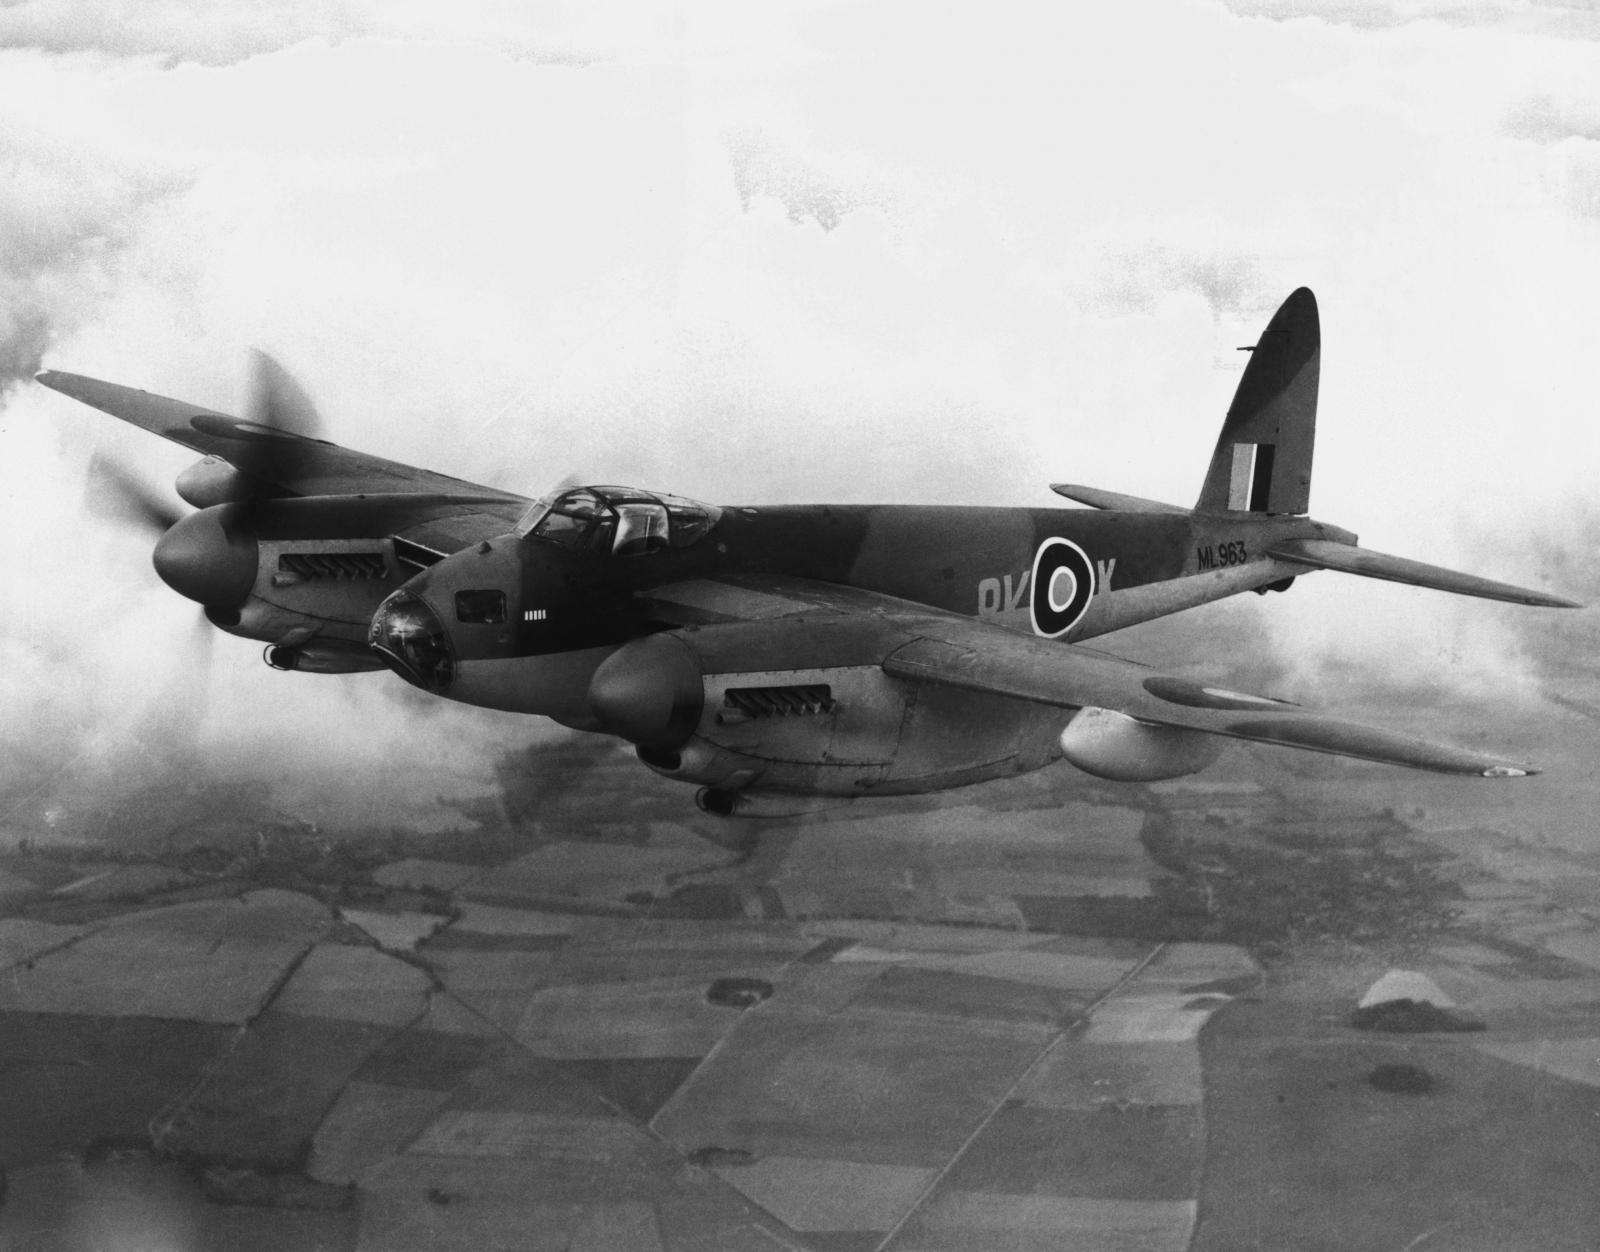 Mosquito bomber blueprints found